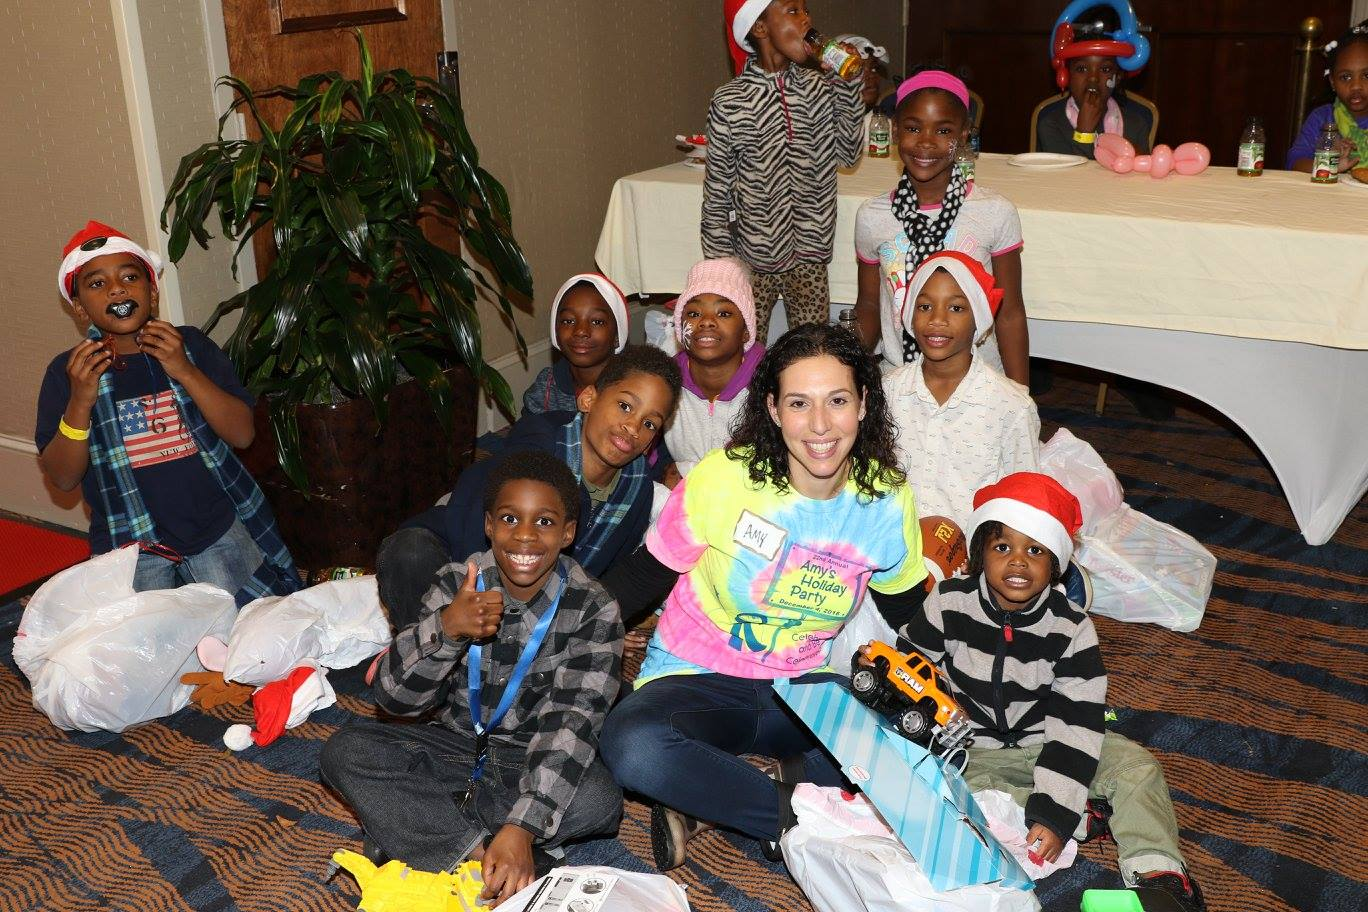 Celebrating Children in Need